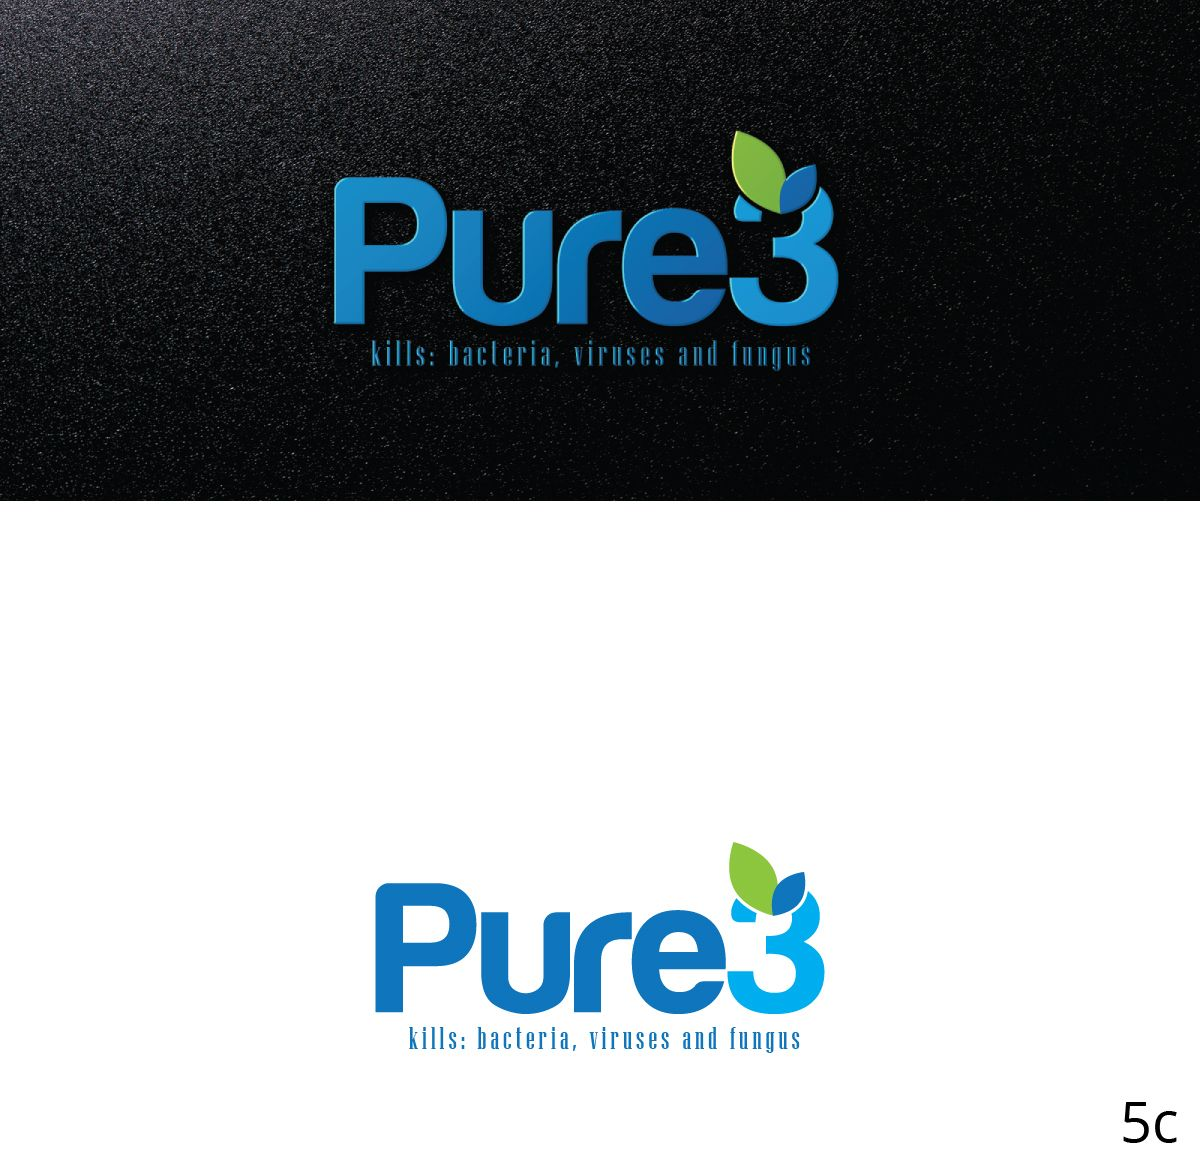 Pure3 Organic Sanitizing Cleaner Elegant, Playful Logo Design by Designanddevelopment